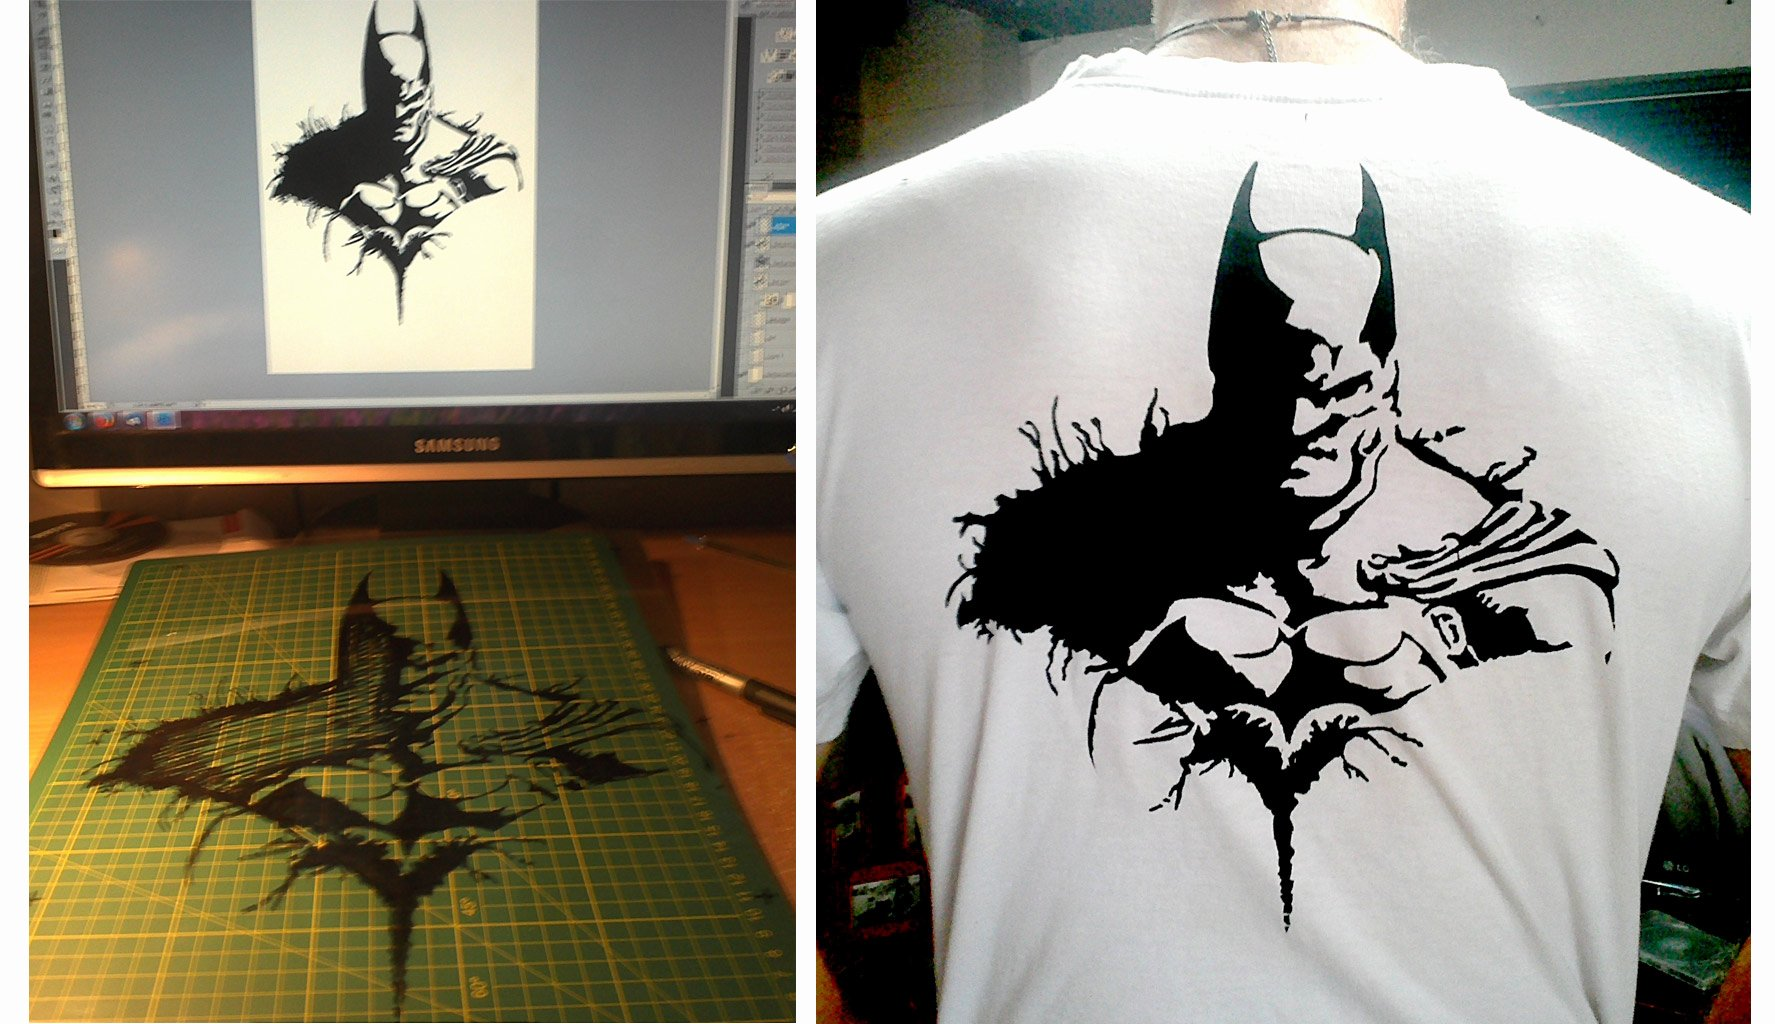 Batman Stencil Art Lovely Batman Stencil by Telephunkn On Deviantart